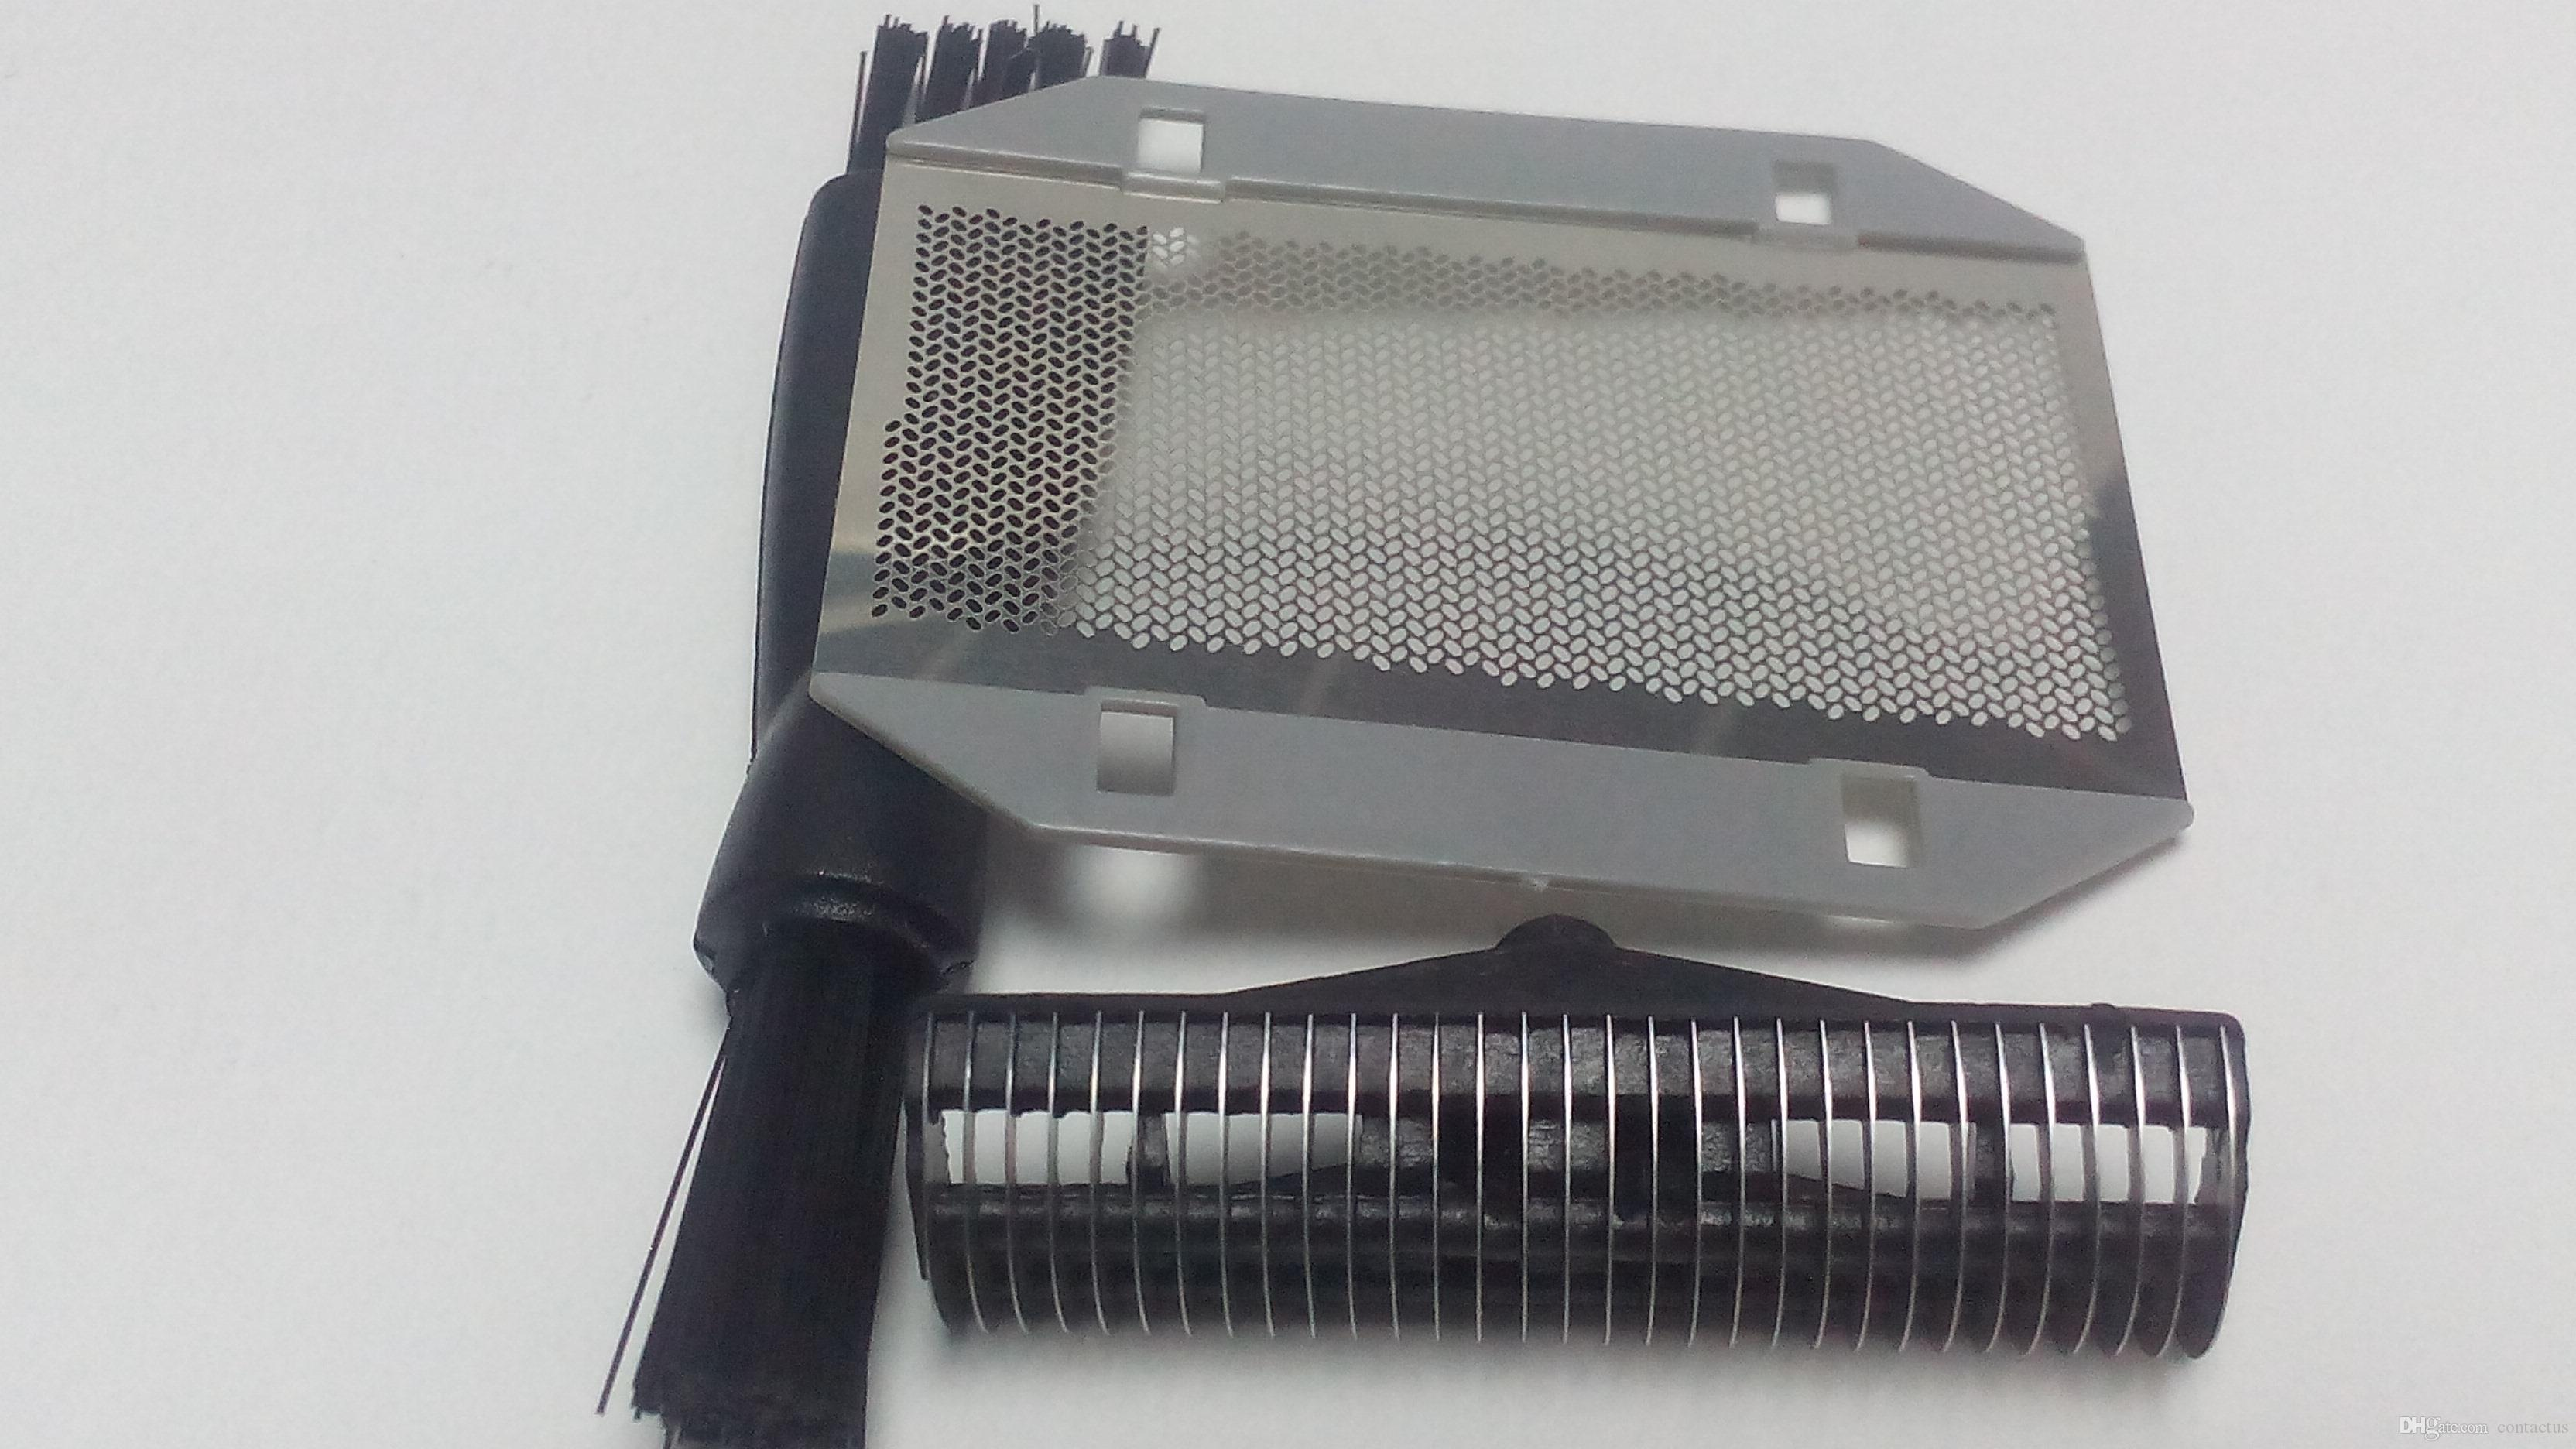 Nouvel écran extérieur de rasoir + barbe de rasoir pour Panasonic ES893 ES-RC30 ES-RC40 ES-SA40 ES-RP20 ES-RP40 ES9942 ES3040 WES9941P